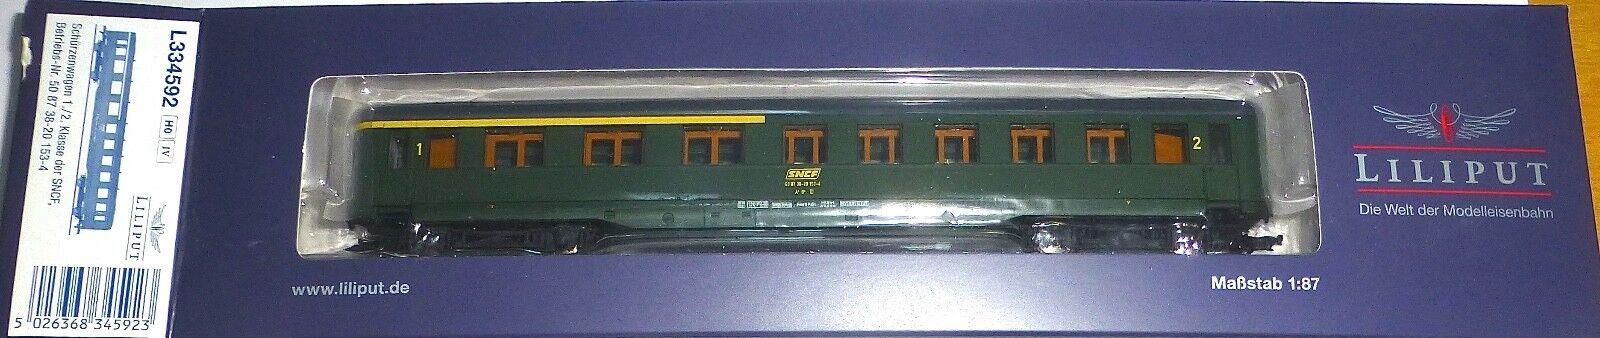 SNCF grembiuli carrello 1/2te KL 50 87 38-20 153-4 ep4 Liliput l334592 h0 1:87 OVP *